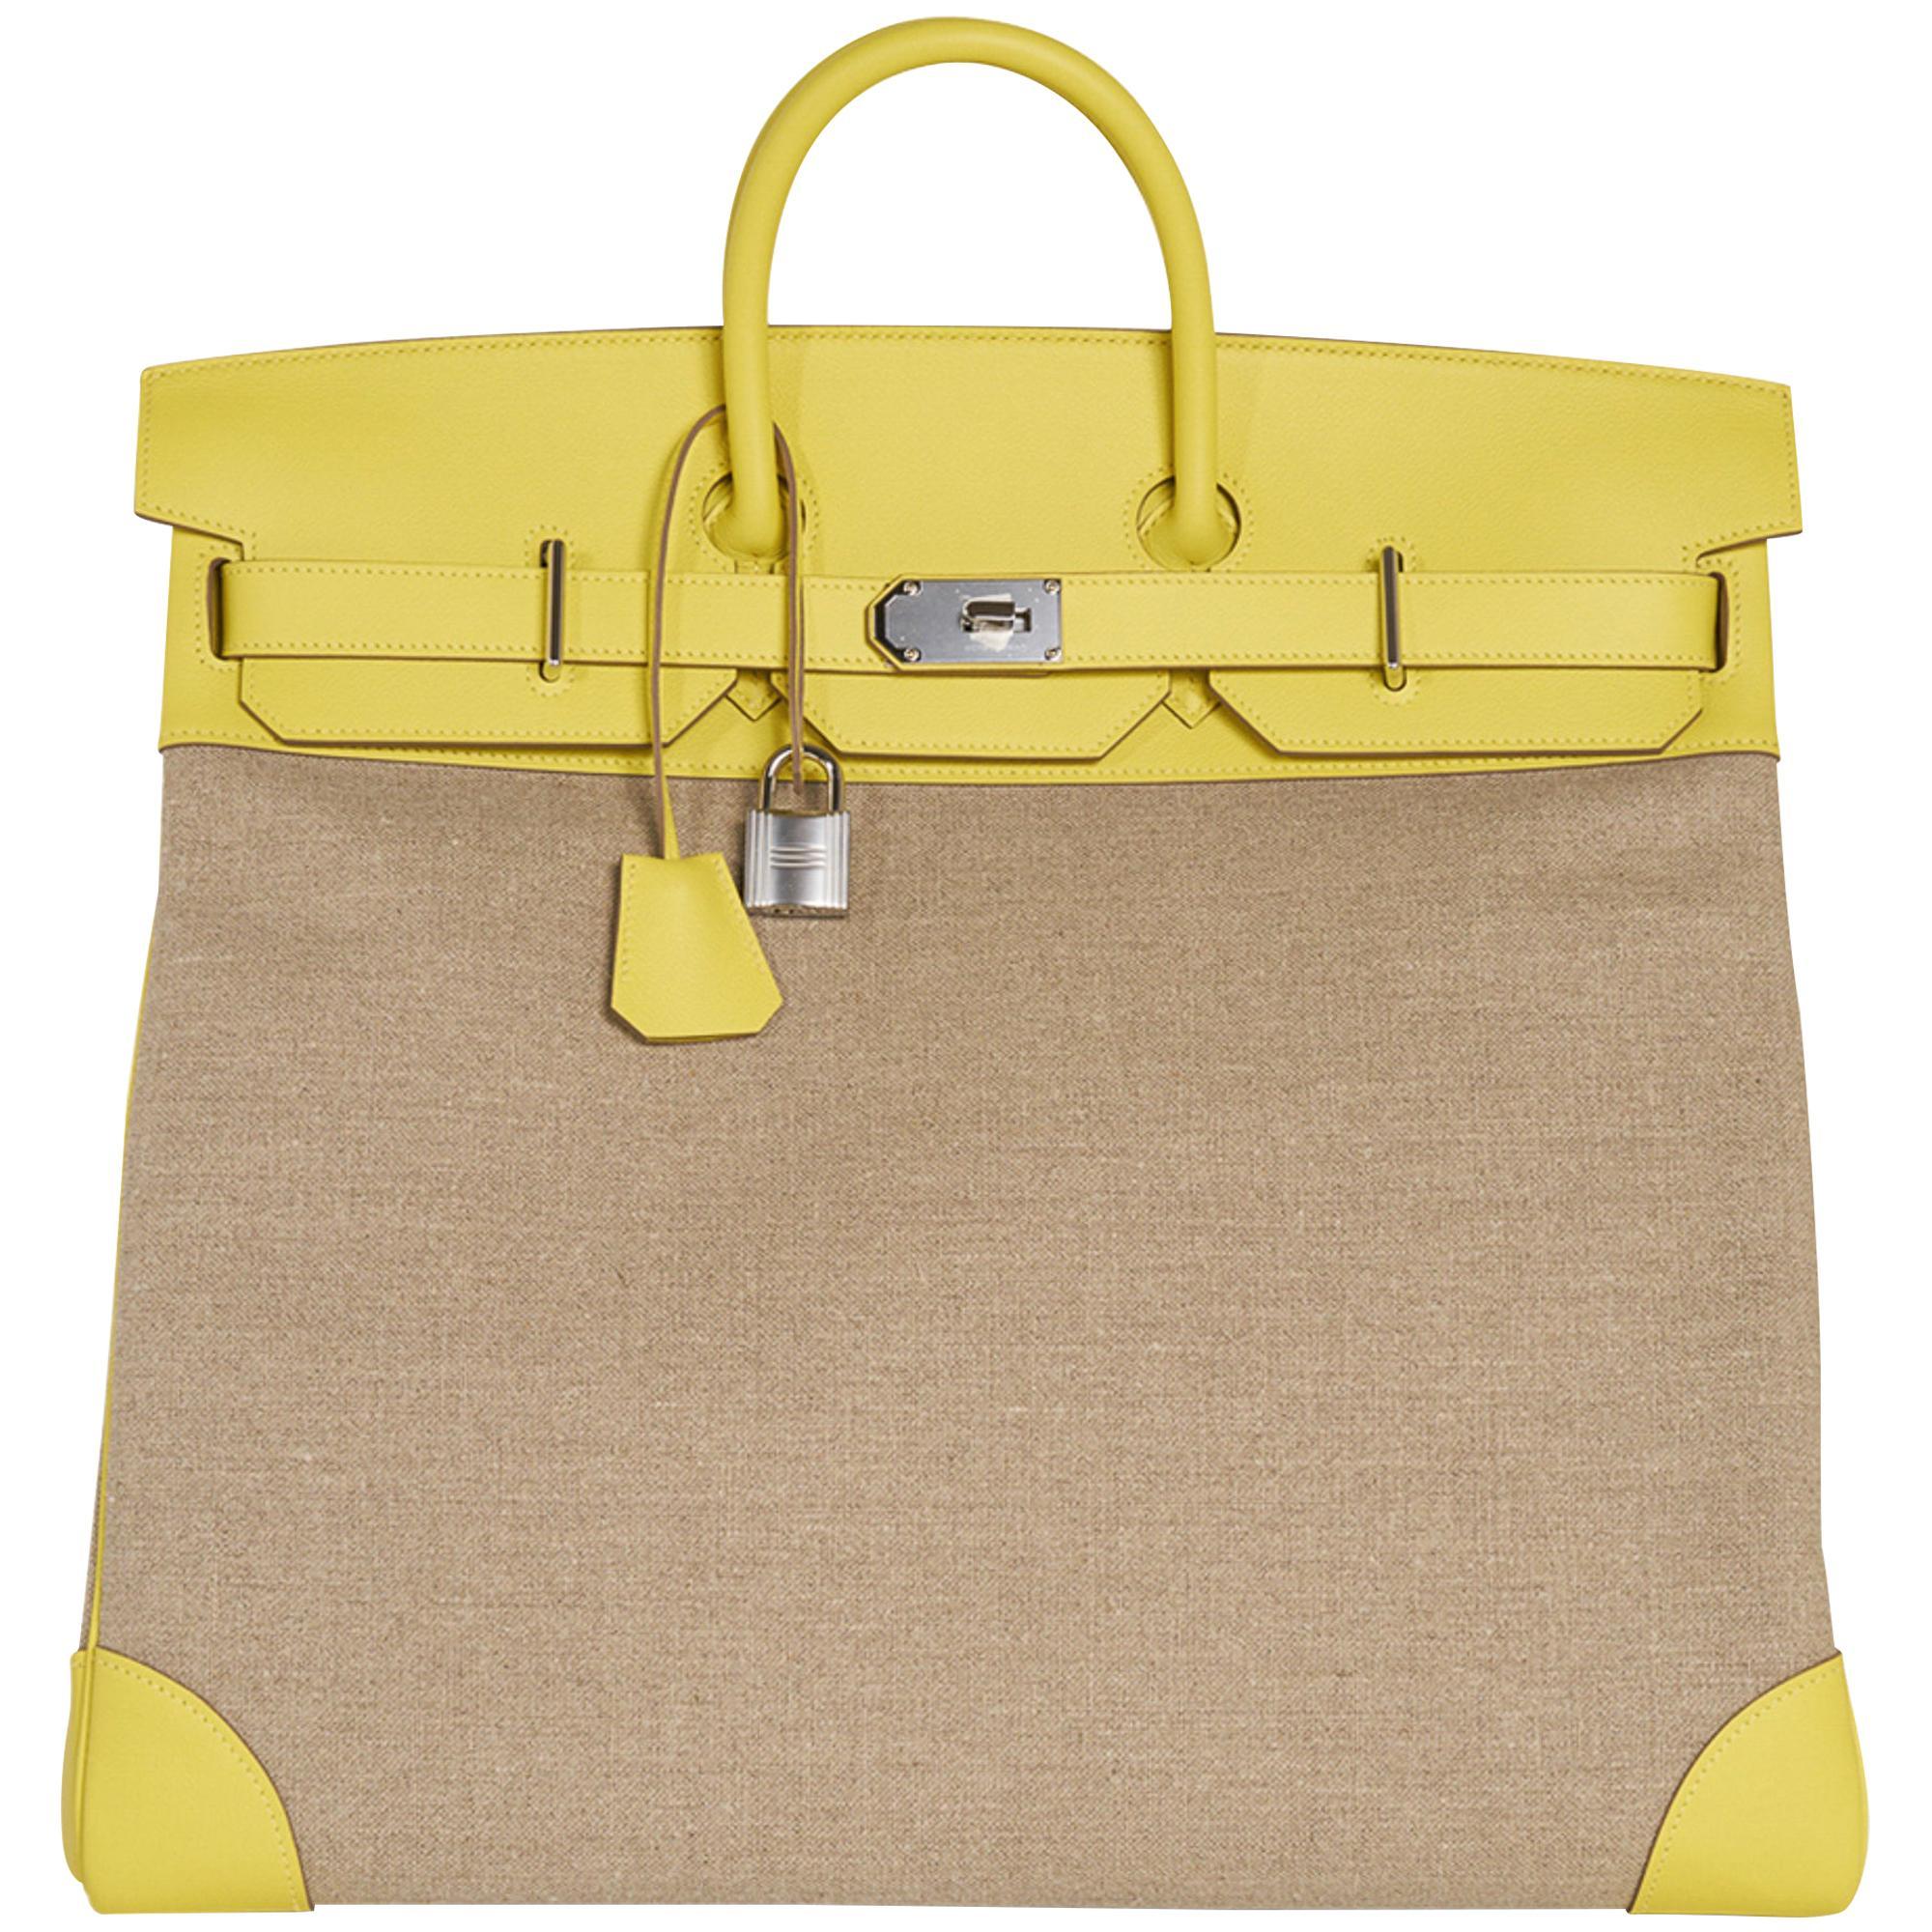 Hermes Bag Hac 50 Lime Evercolor Ficelle Toile Palladium Hardware New w/Box